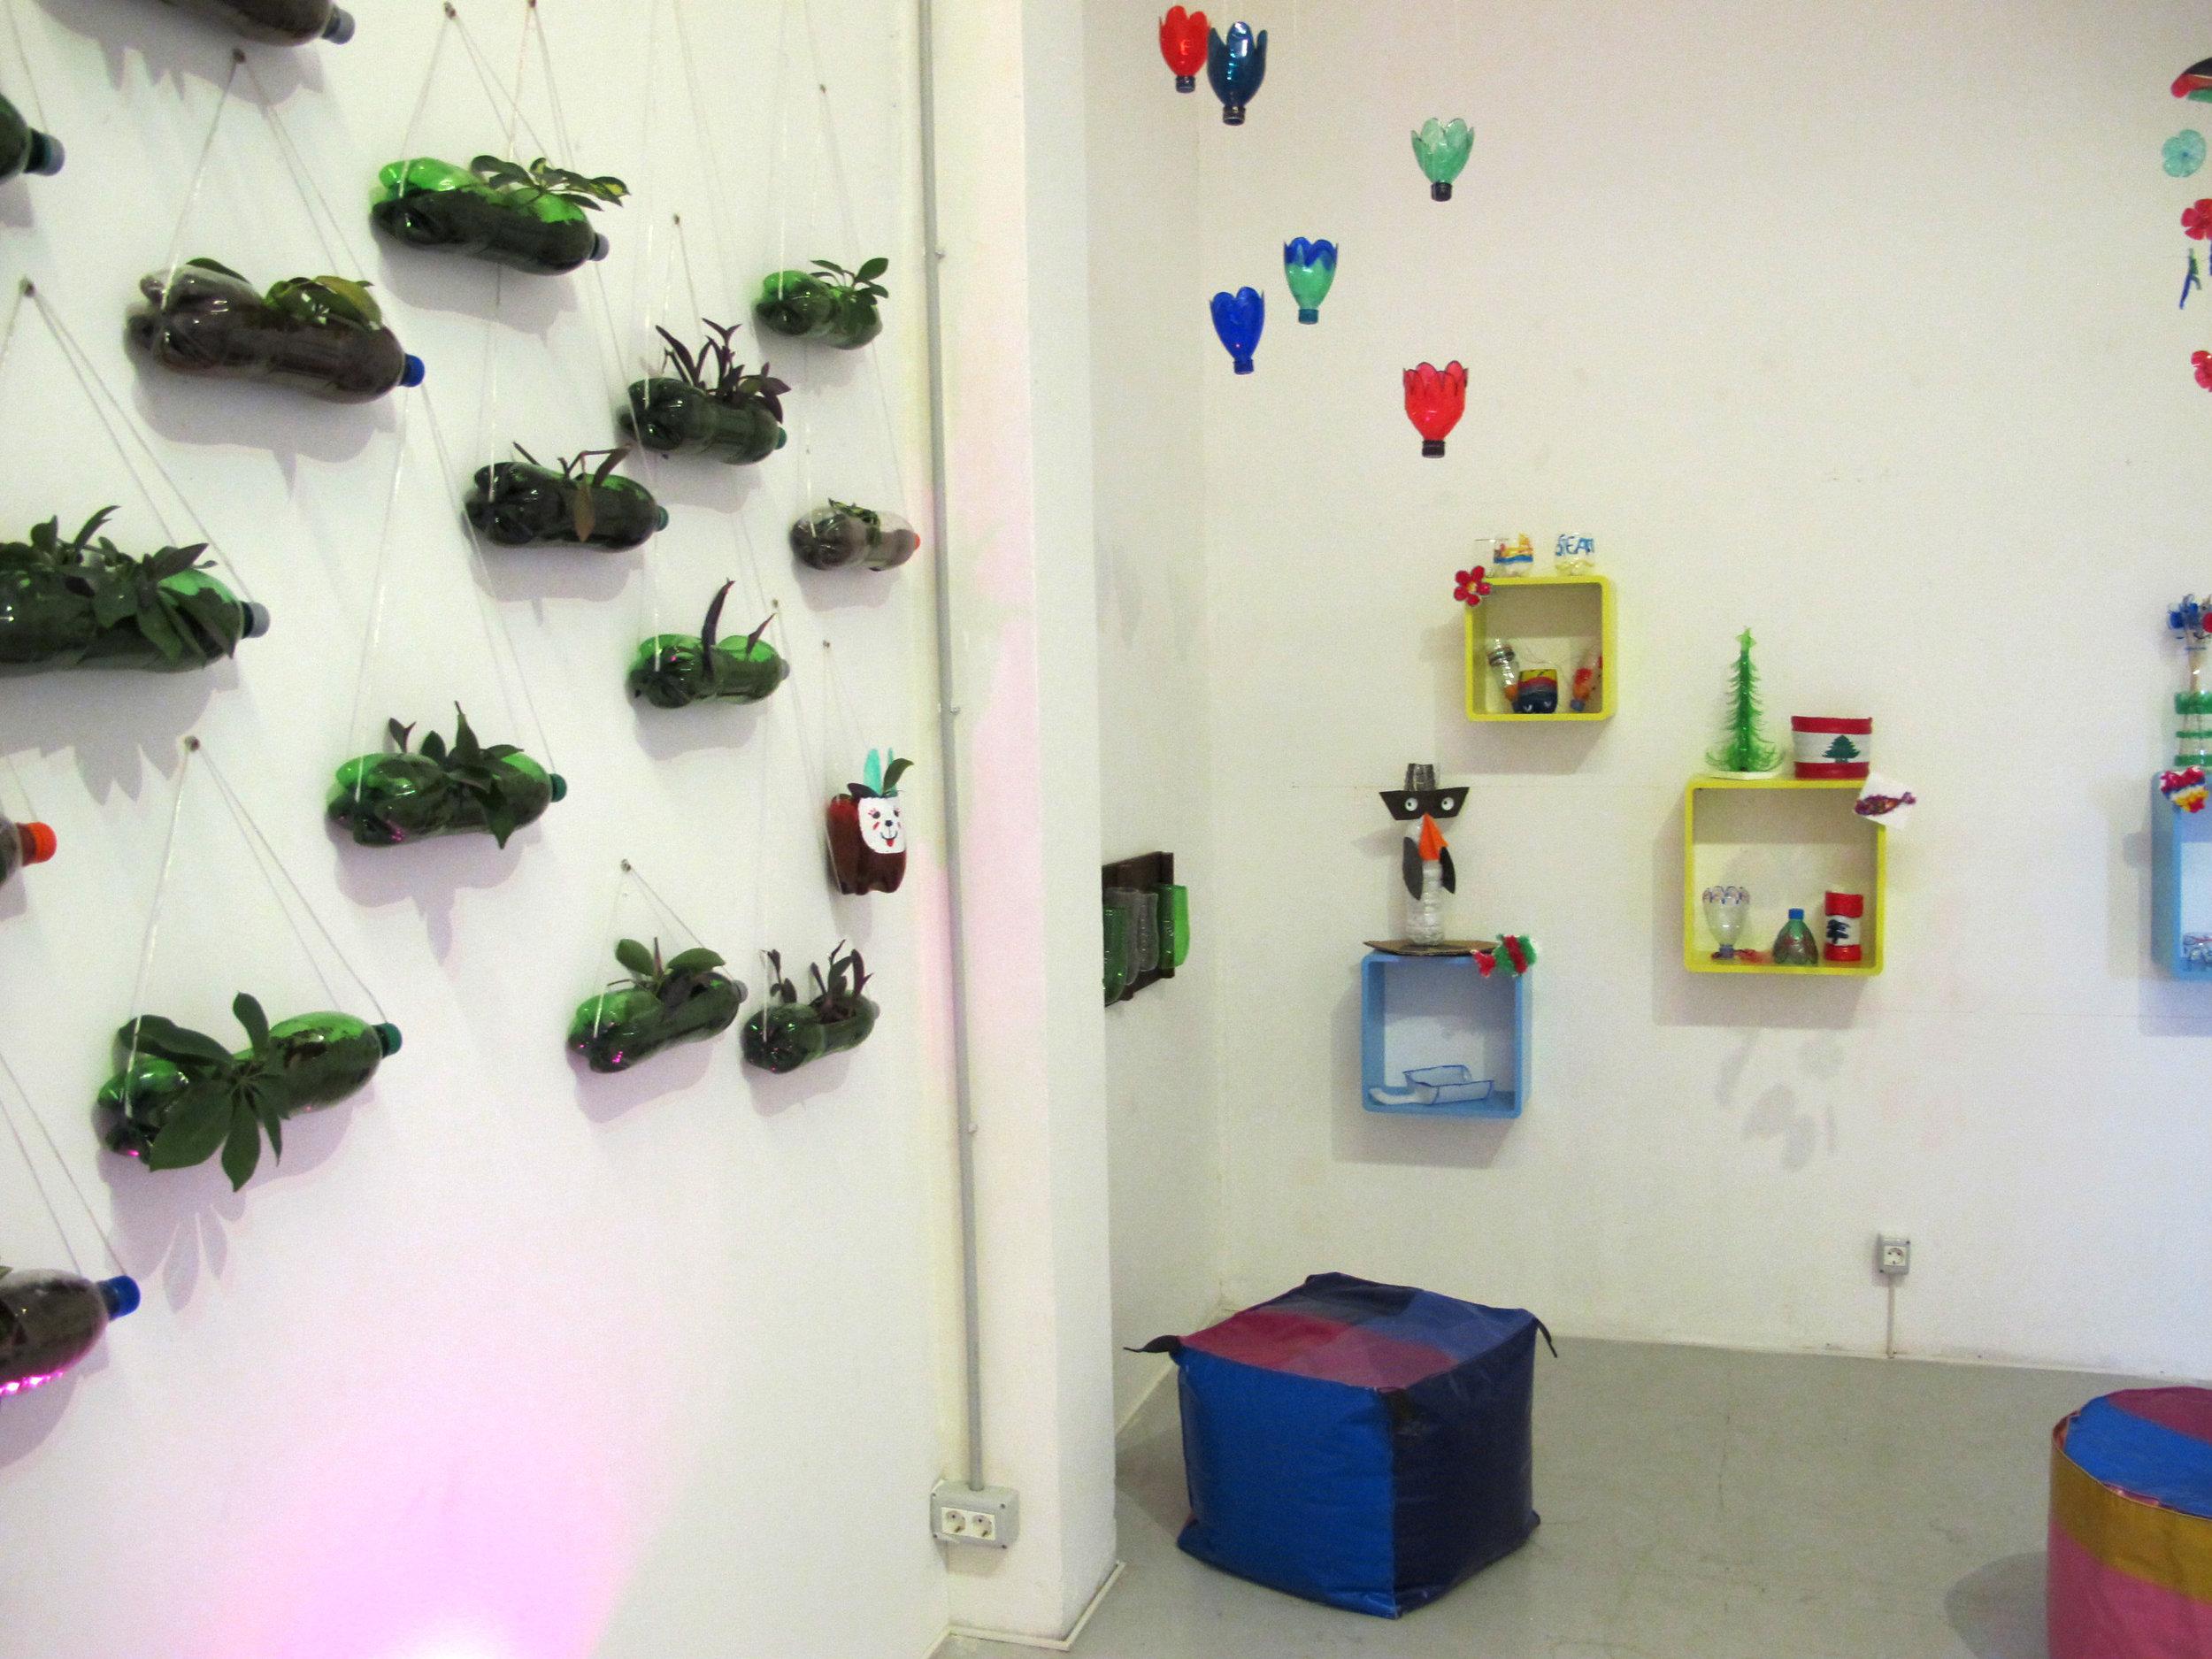 Exhibition_Lebanon_7.JPG